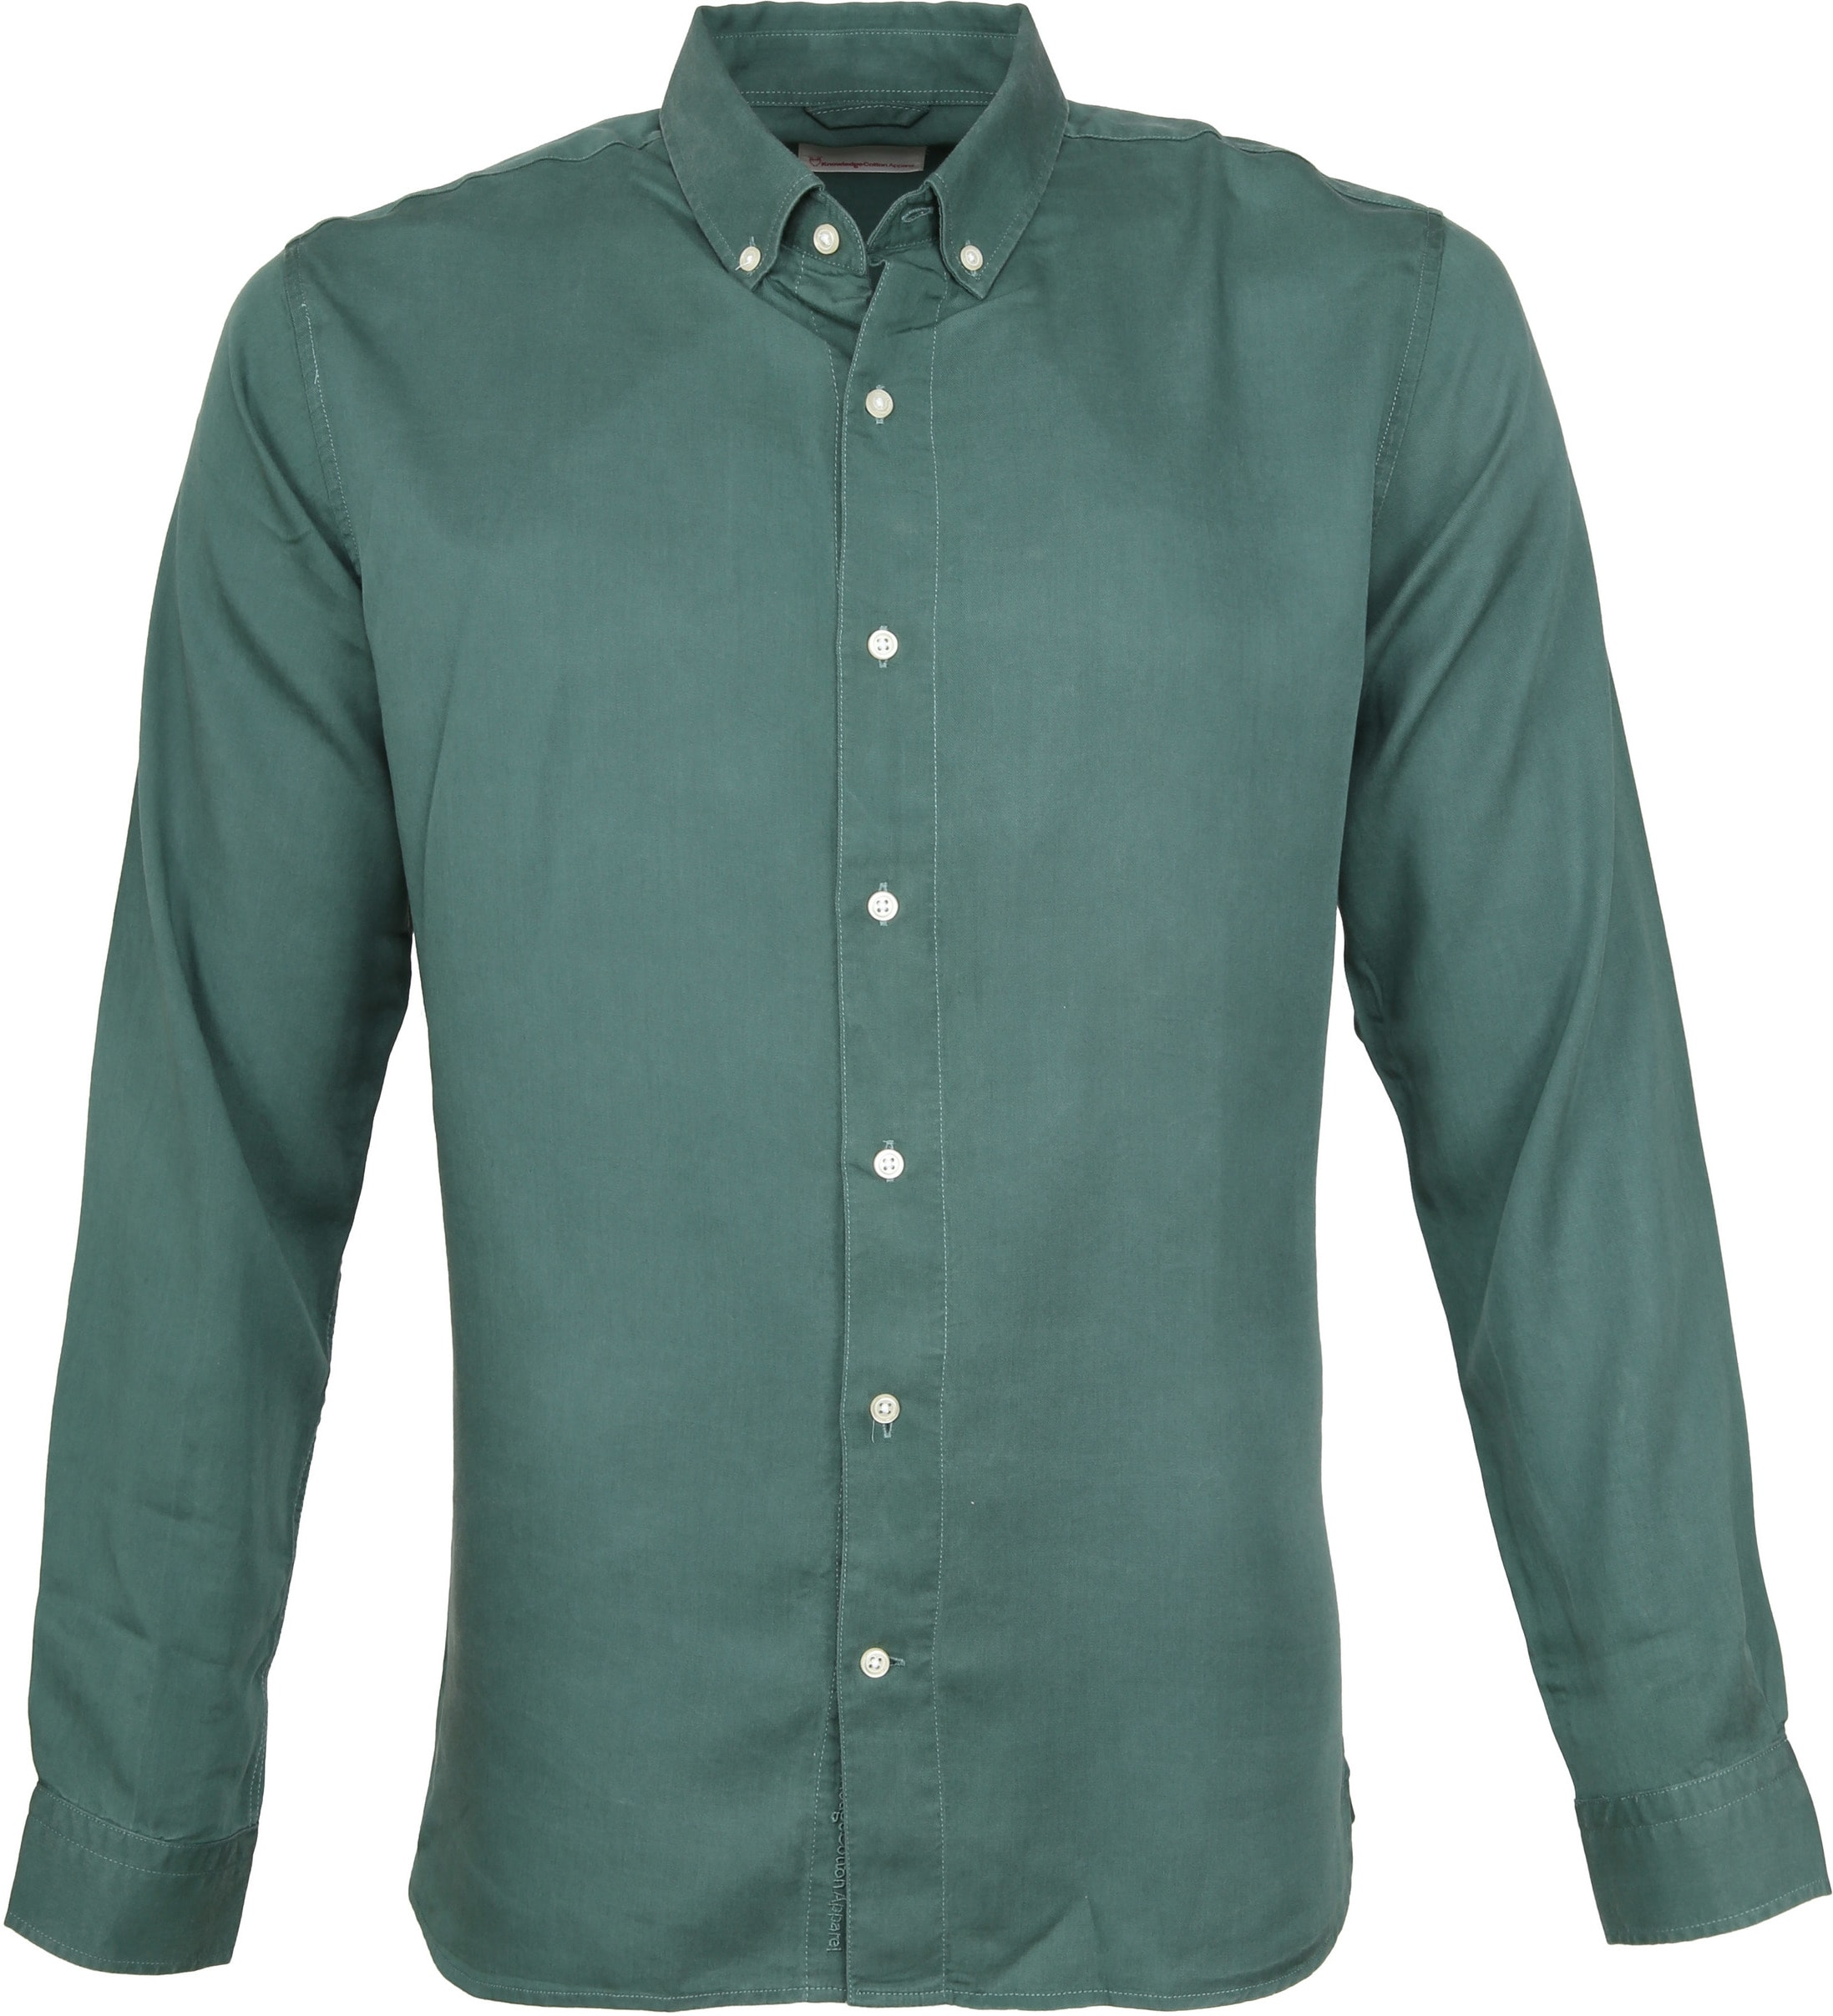 Knowledge Cotton Apparel Overhemd Groen foto 0